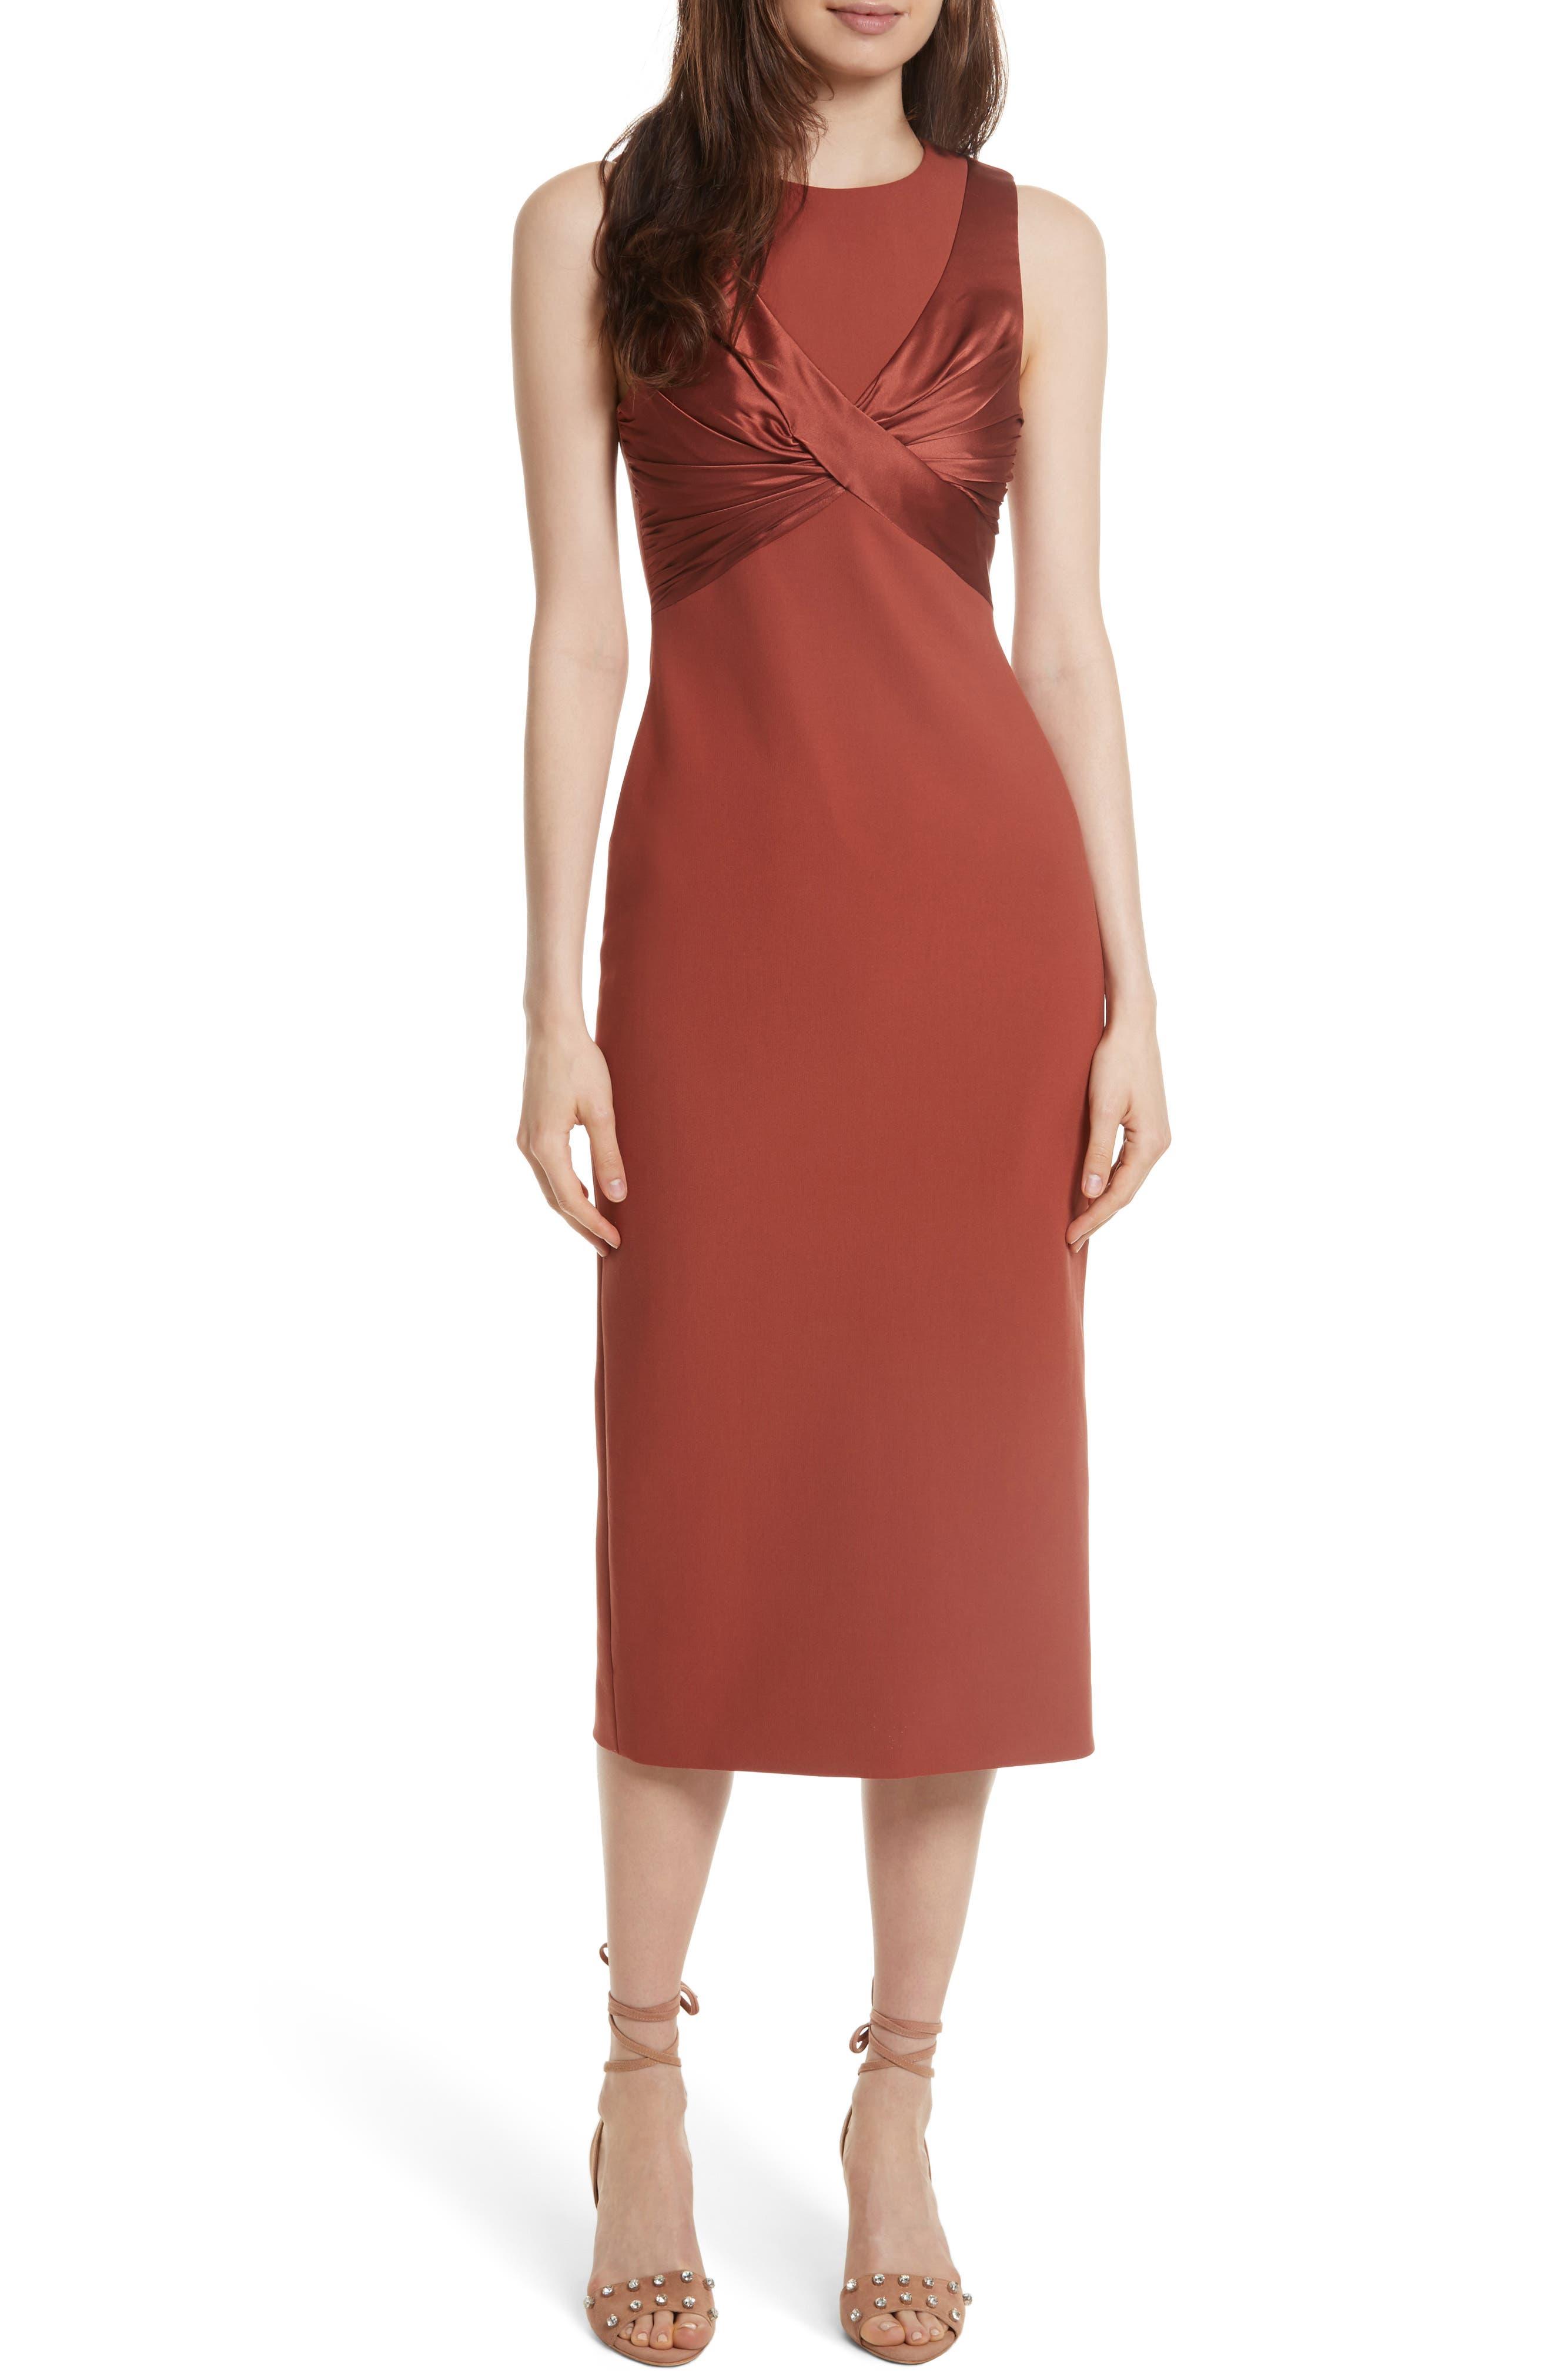 Adelise Crossover Sleeveless Sheath Dress,                         Main,                         color, 845